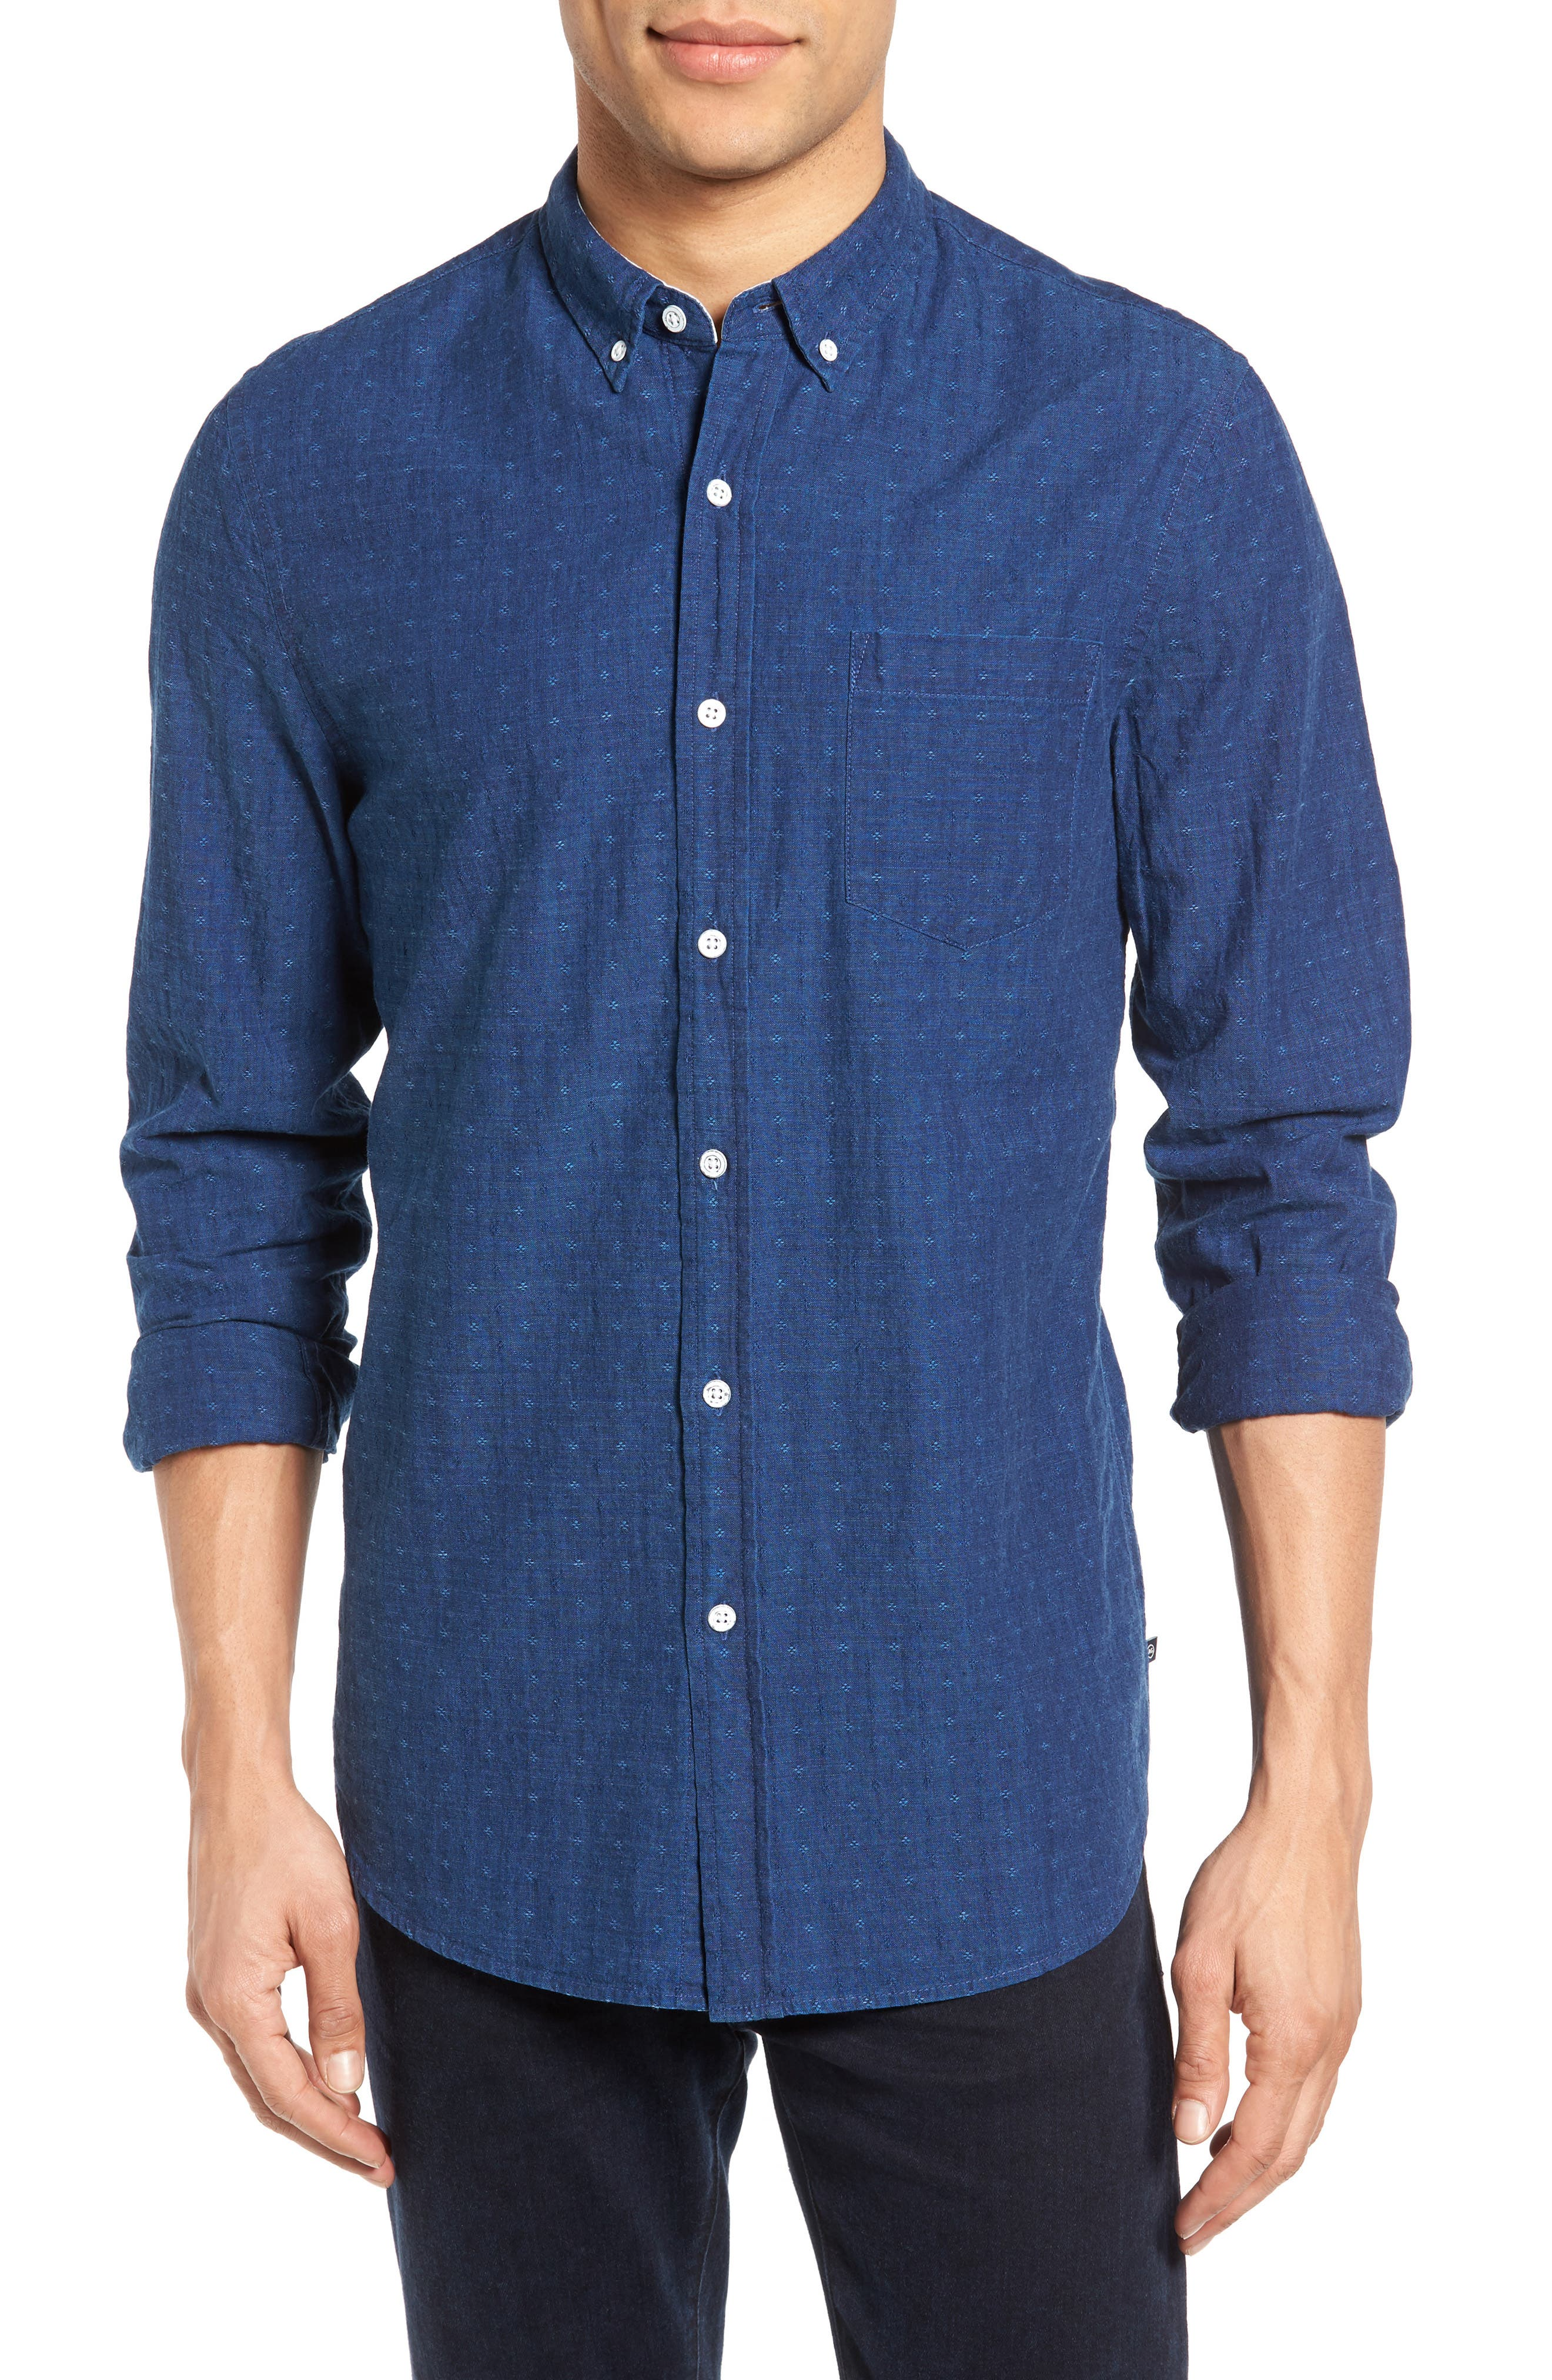 Main Image - AG Grady Trim Fit Jacquard Sport Shirt